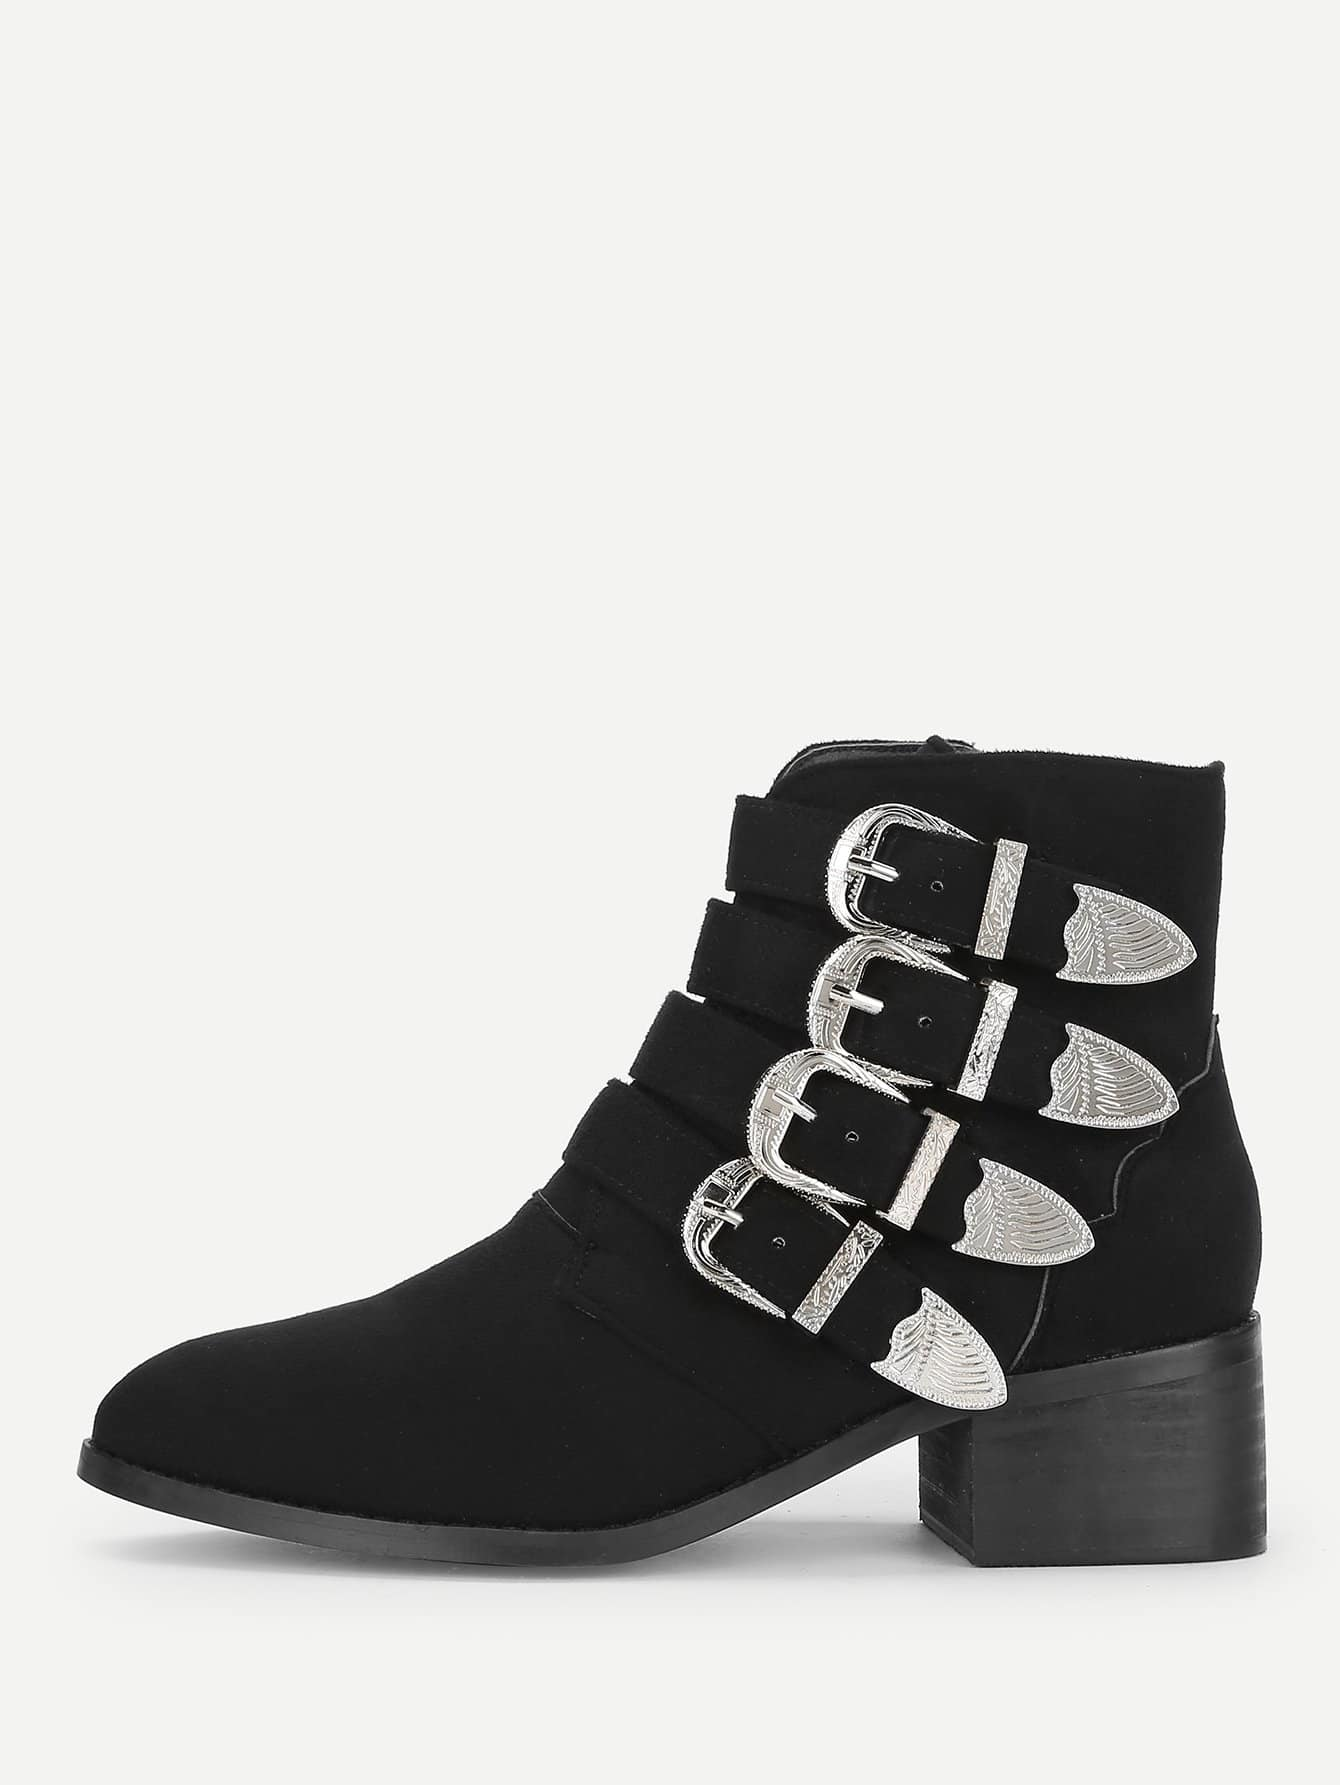 Side Zipper Buckle Boots